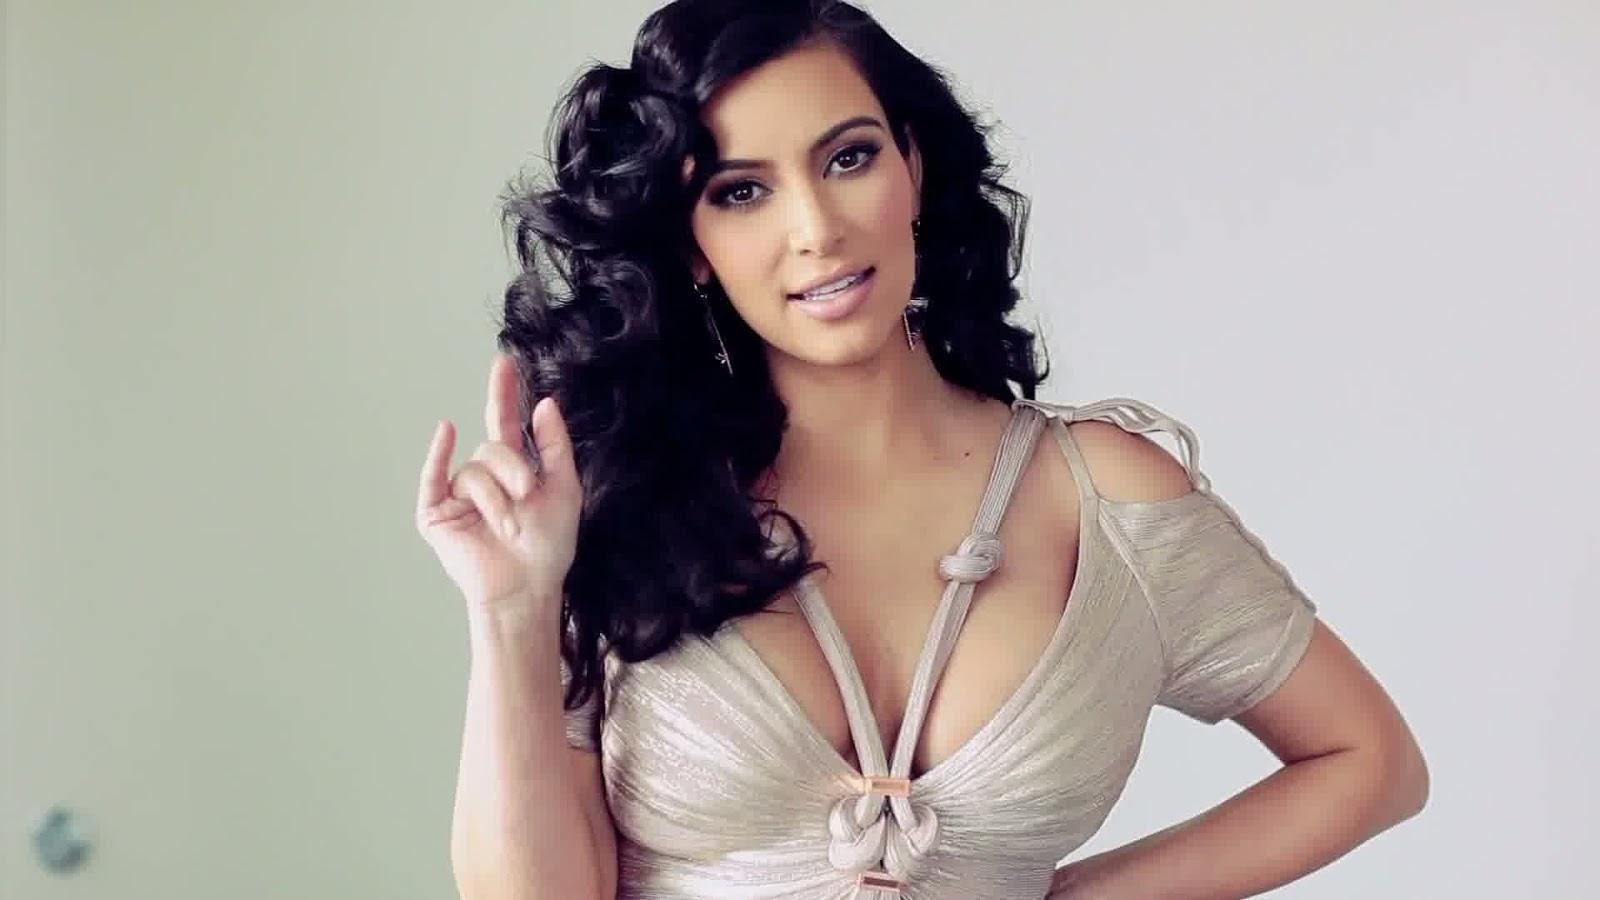 Kim Kardashian Hot HD Wallpapers 2013 1600x900